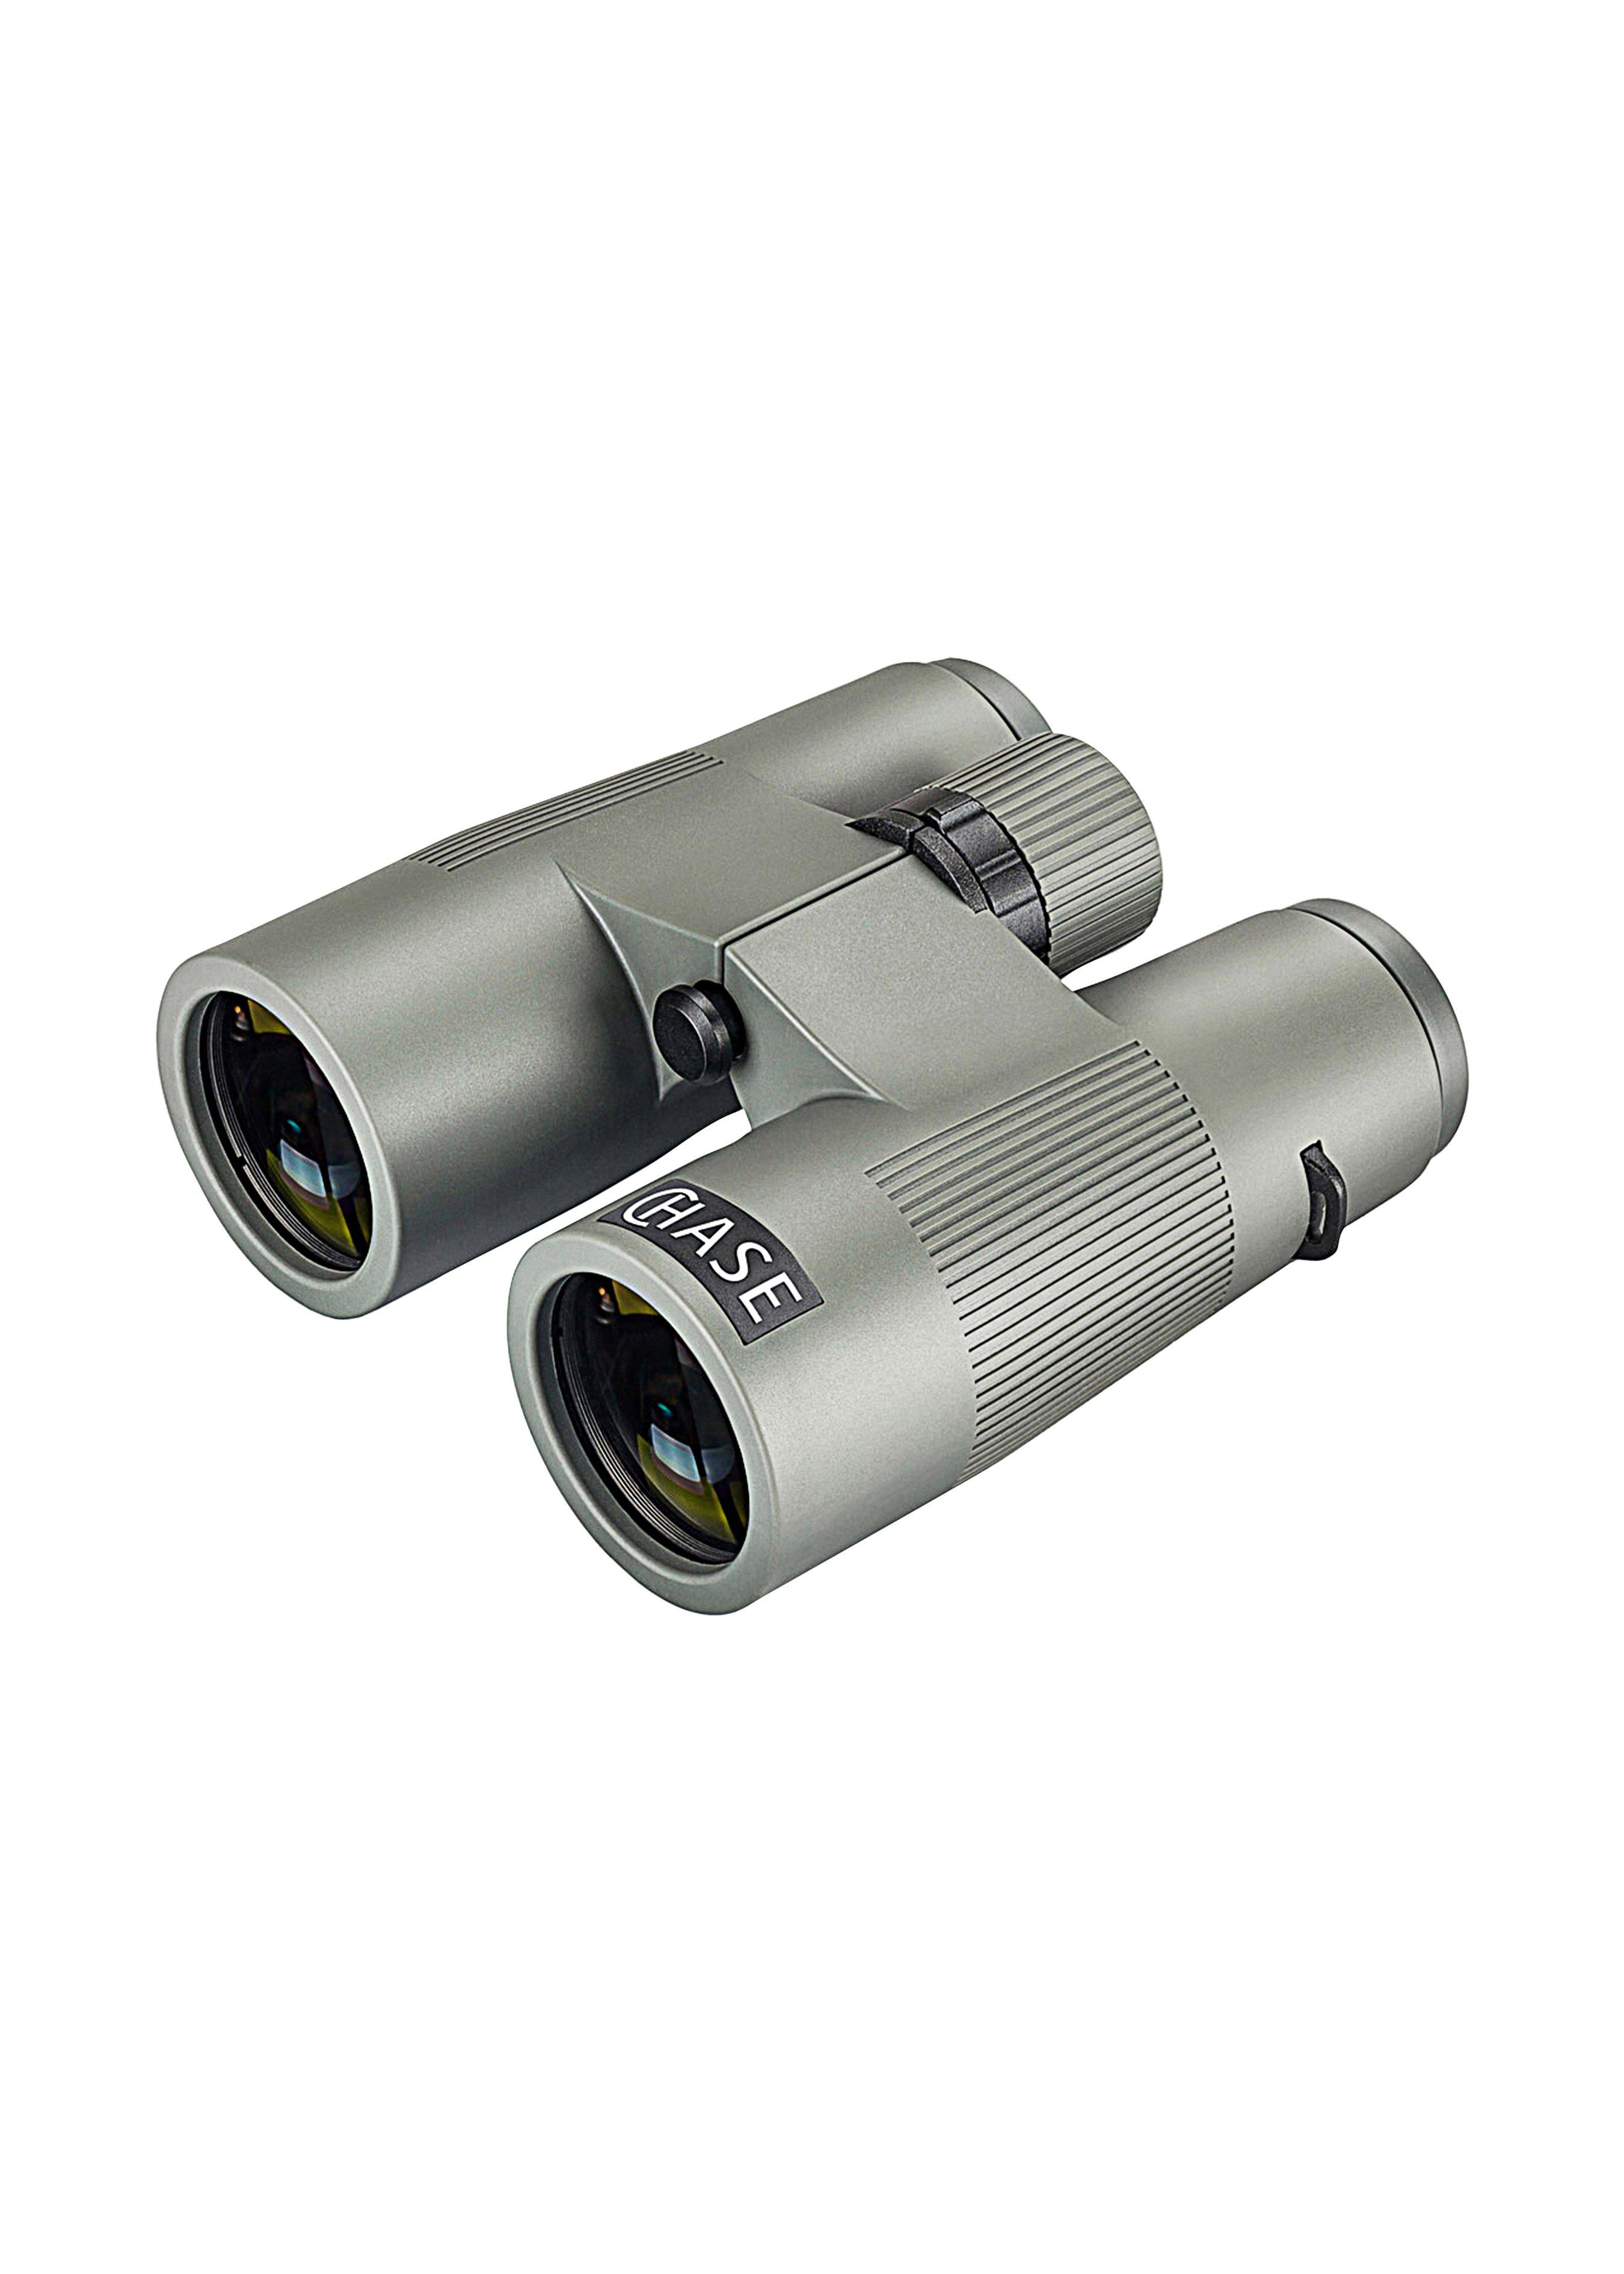 Delta Optical Fernglas/Feldstecher Chase 10x42mm 244524 1